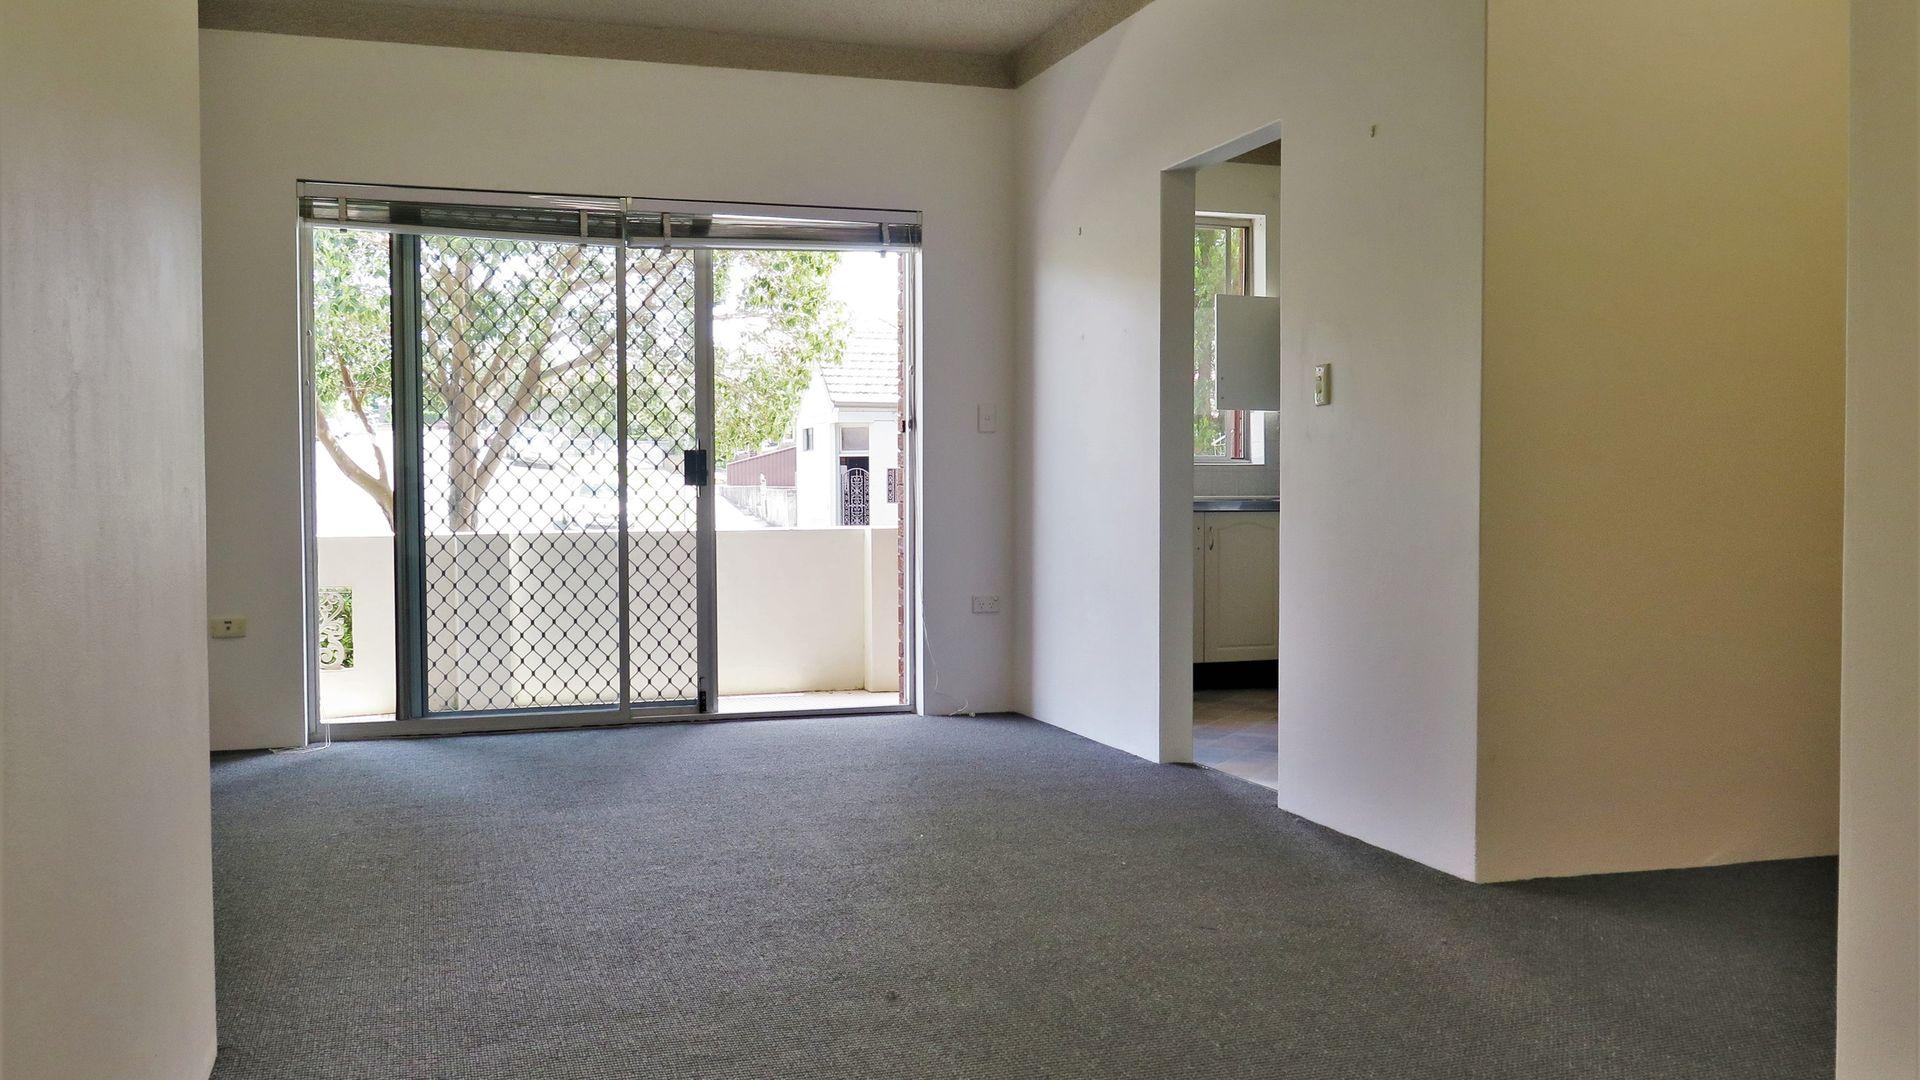 2/30 Guinea street, Kogarah NSW 2217, Image 1